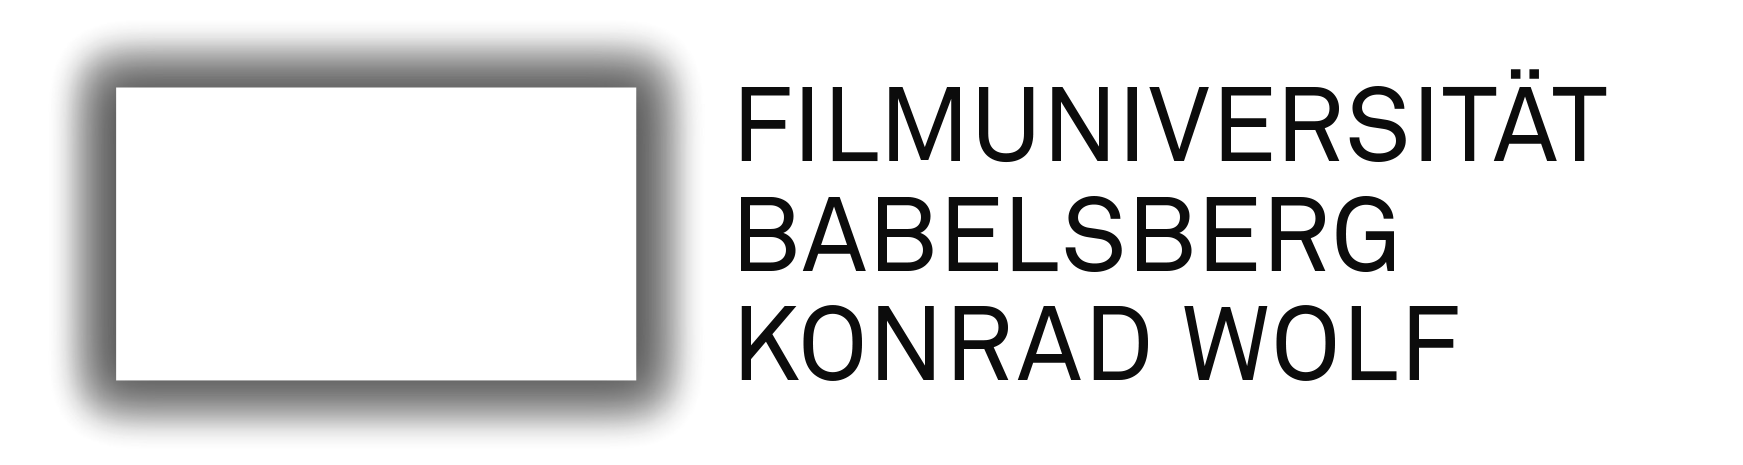 Logo_der_Filmuniversität_Babelsberg_KONRAD_WOLF